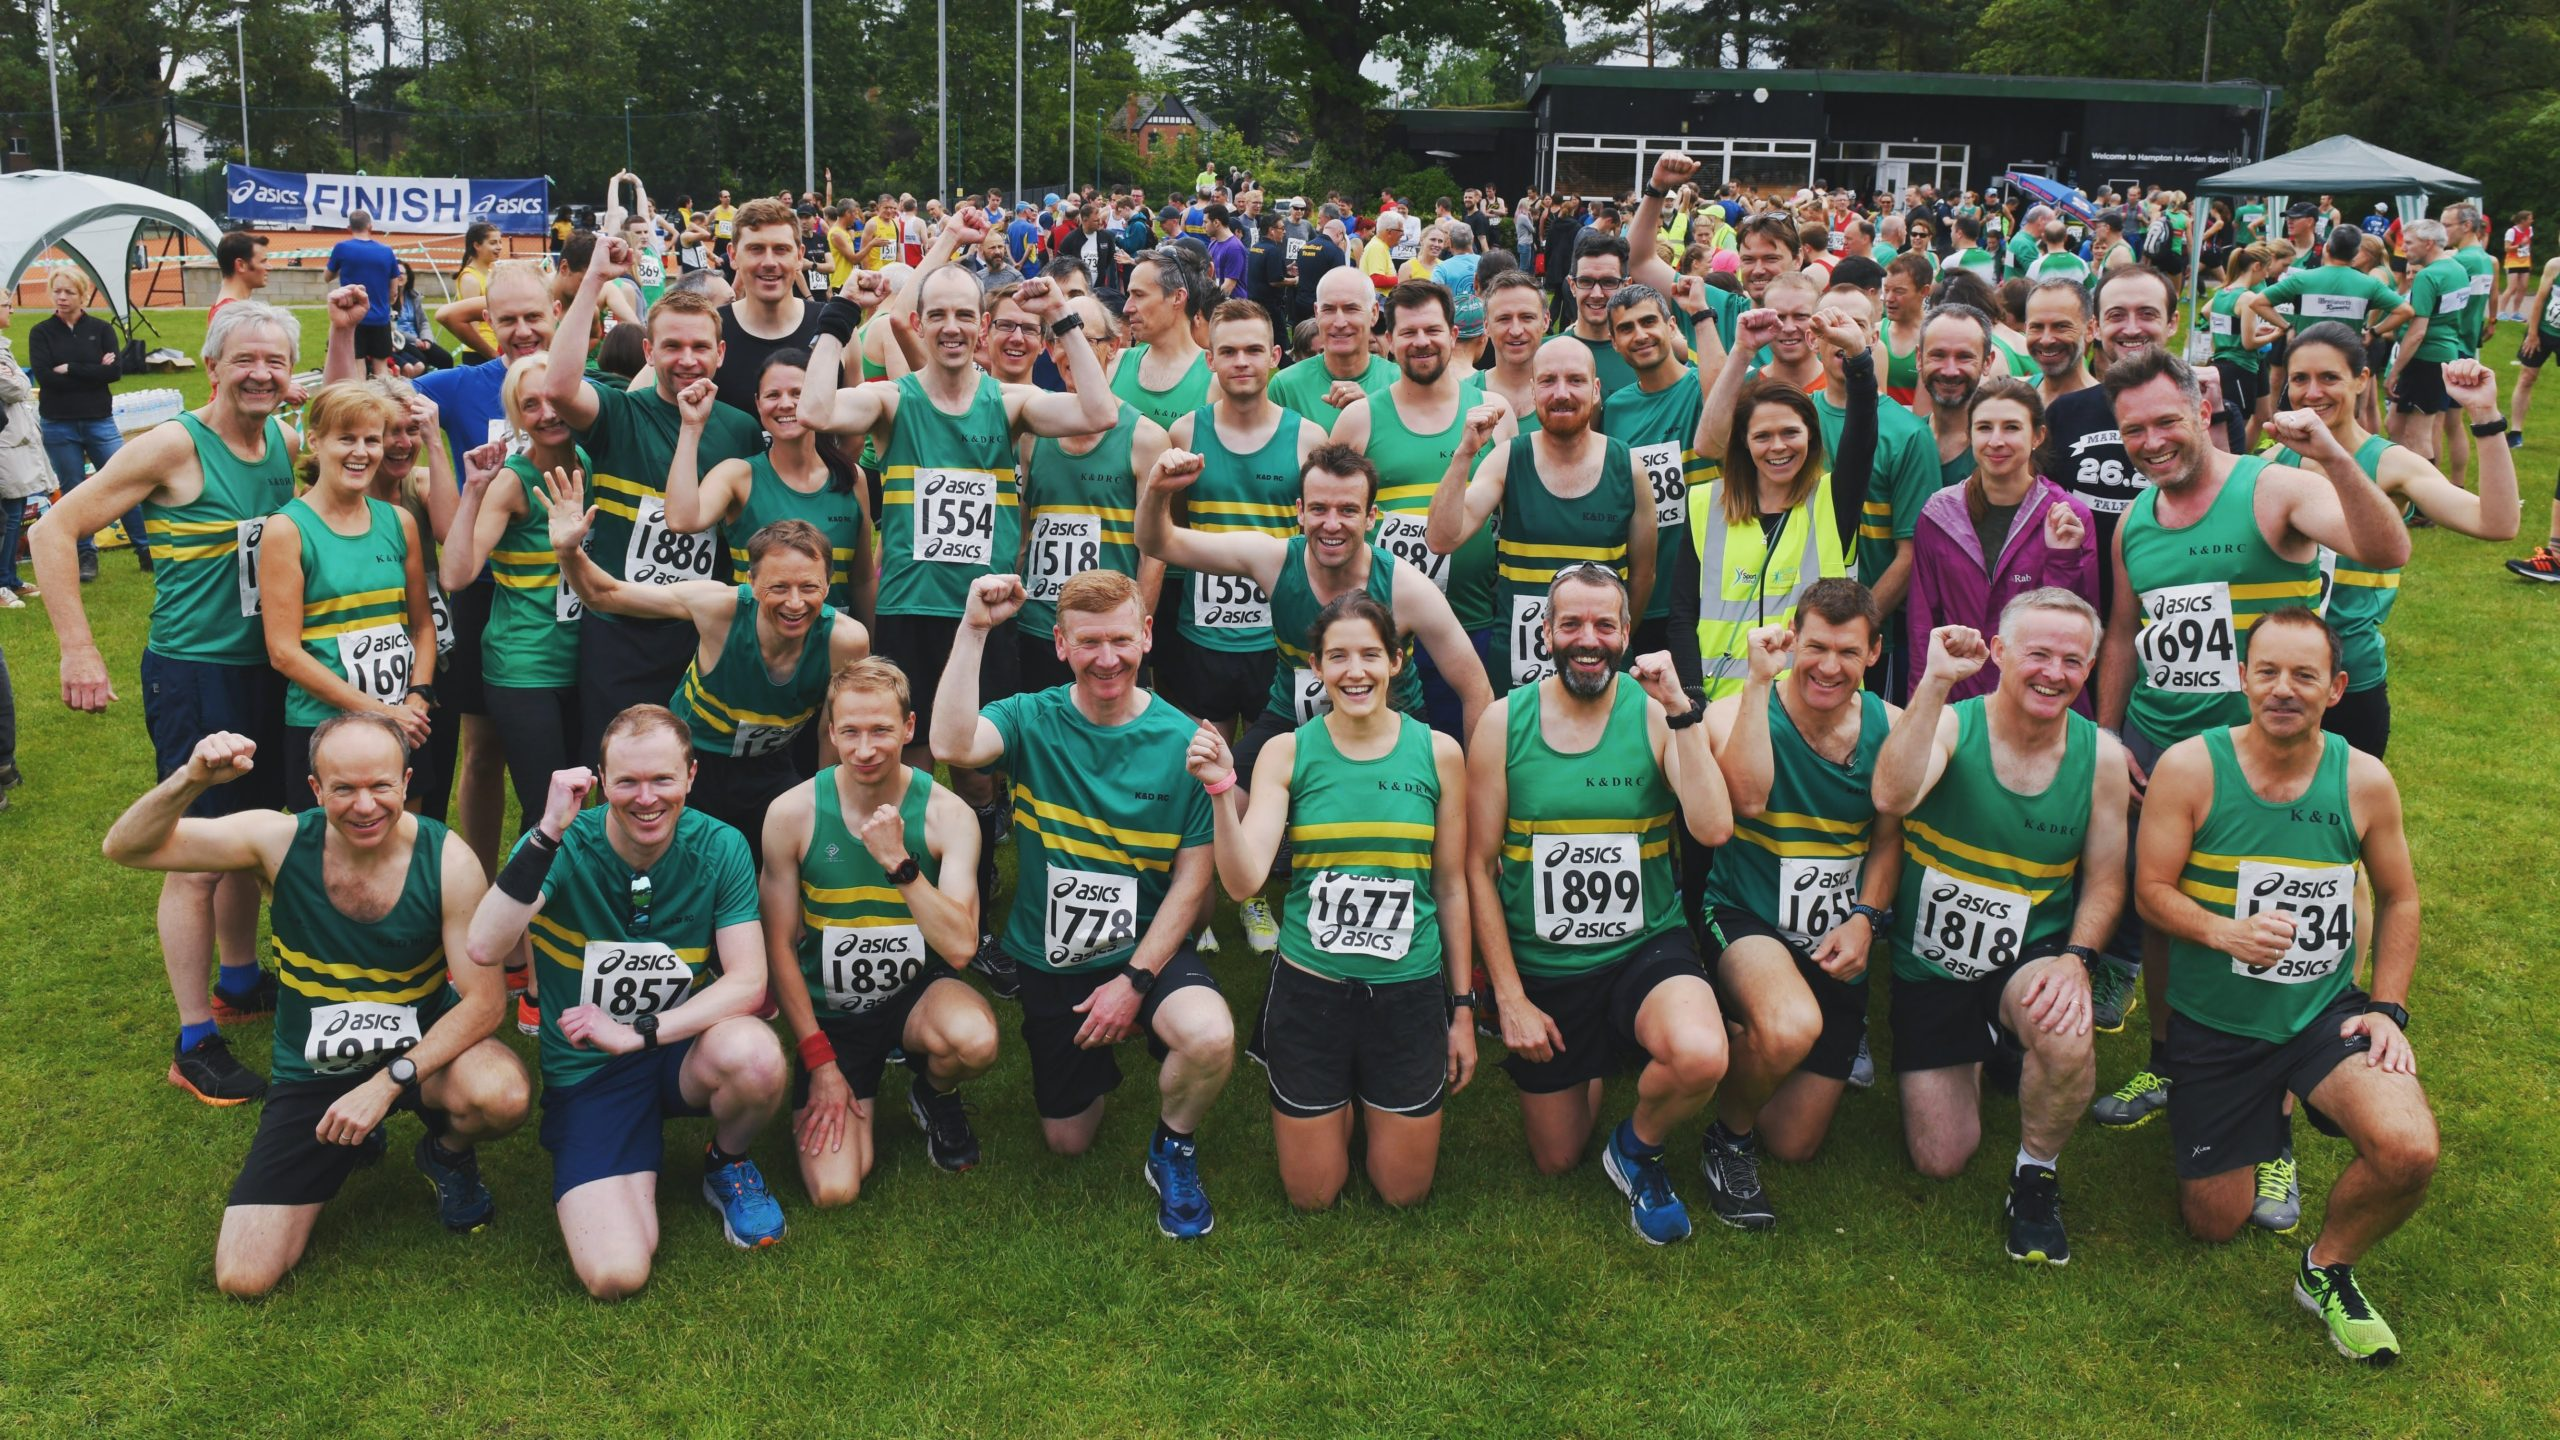 2019 Arden 9 - Knowle and Dorridge Running Club